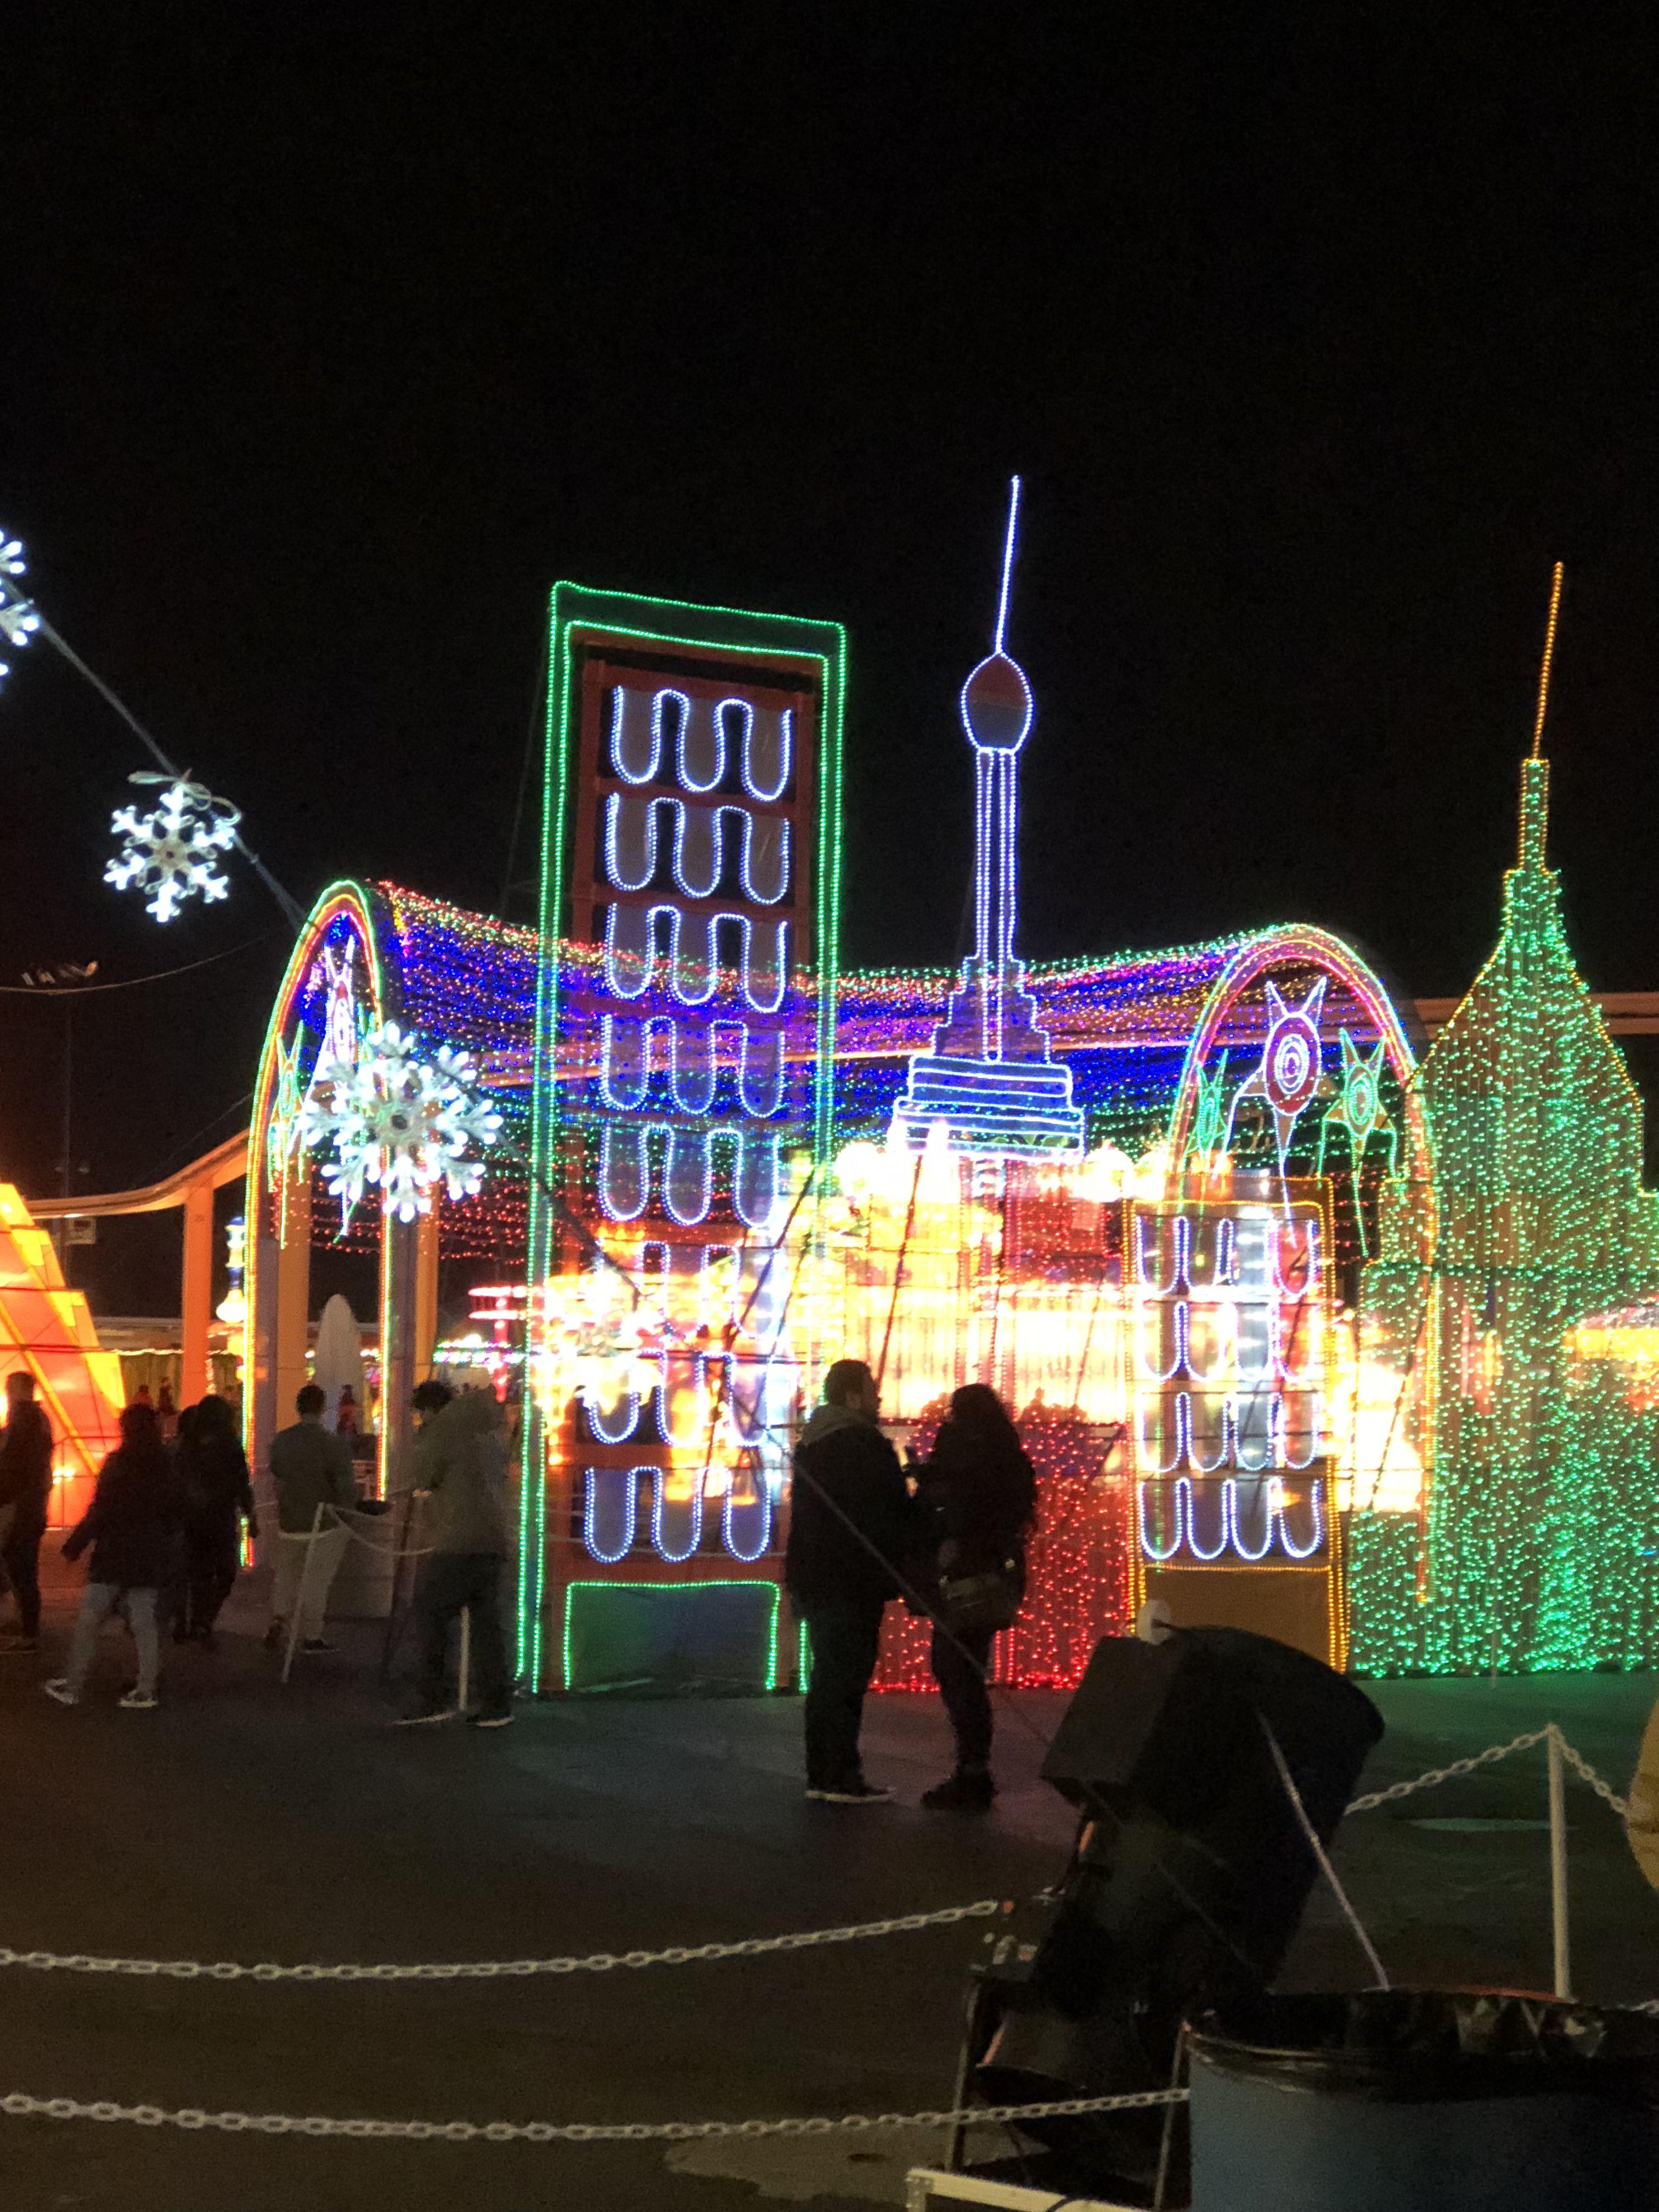 Cal Expo Christmas Lights.Global Winter Wonderland Cal Expo Sacramento Ca A Holly